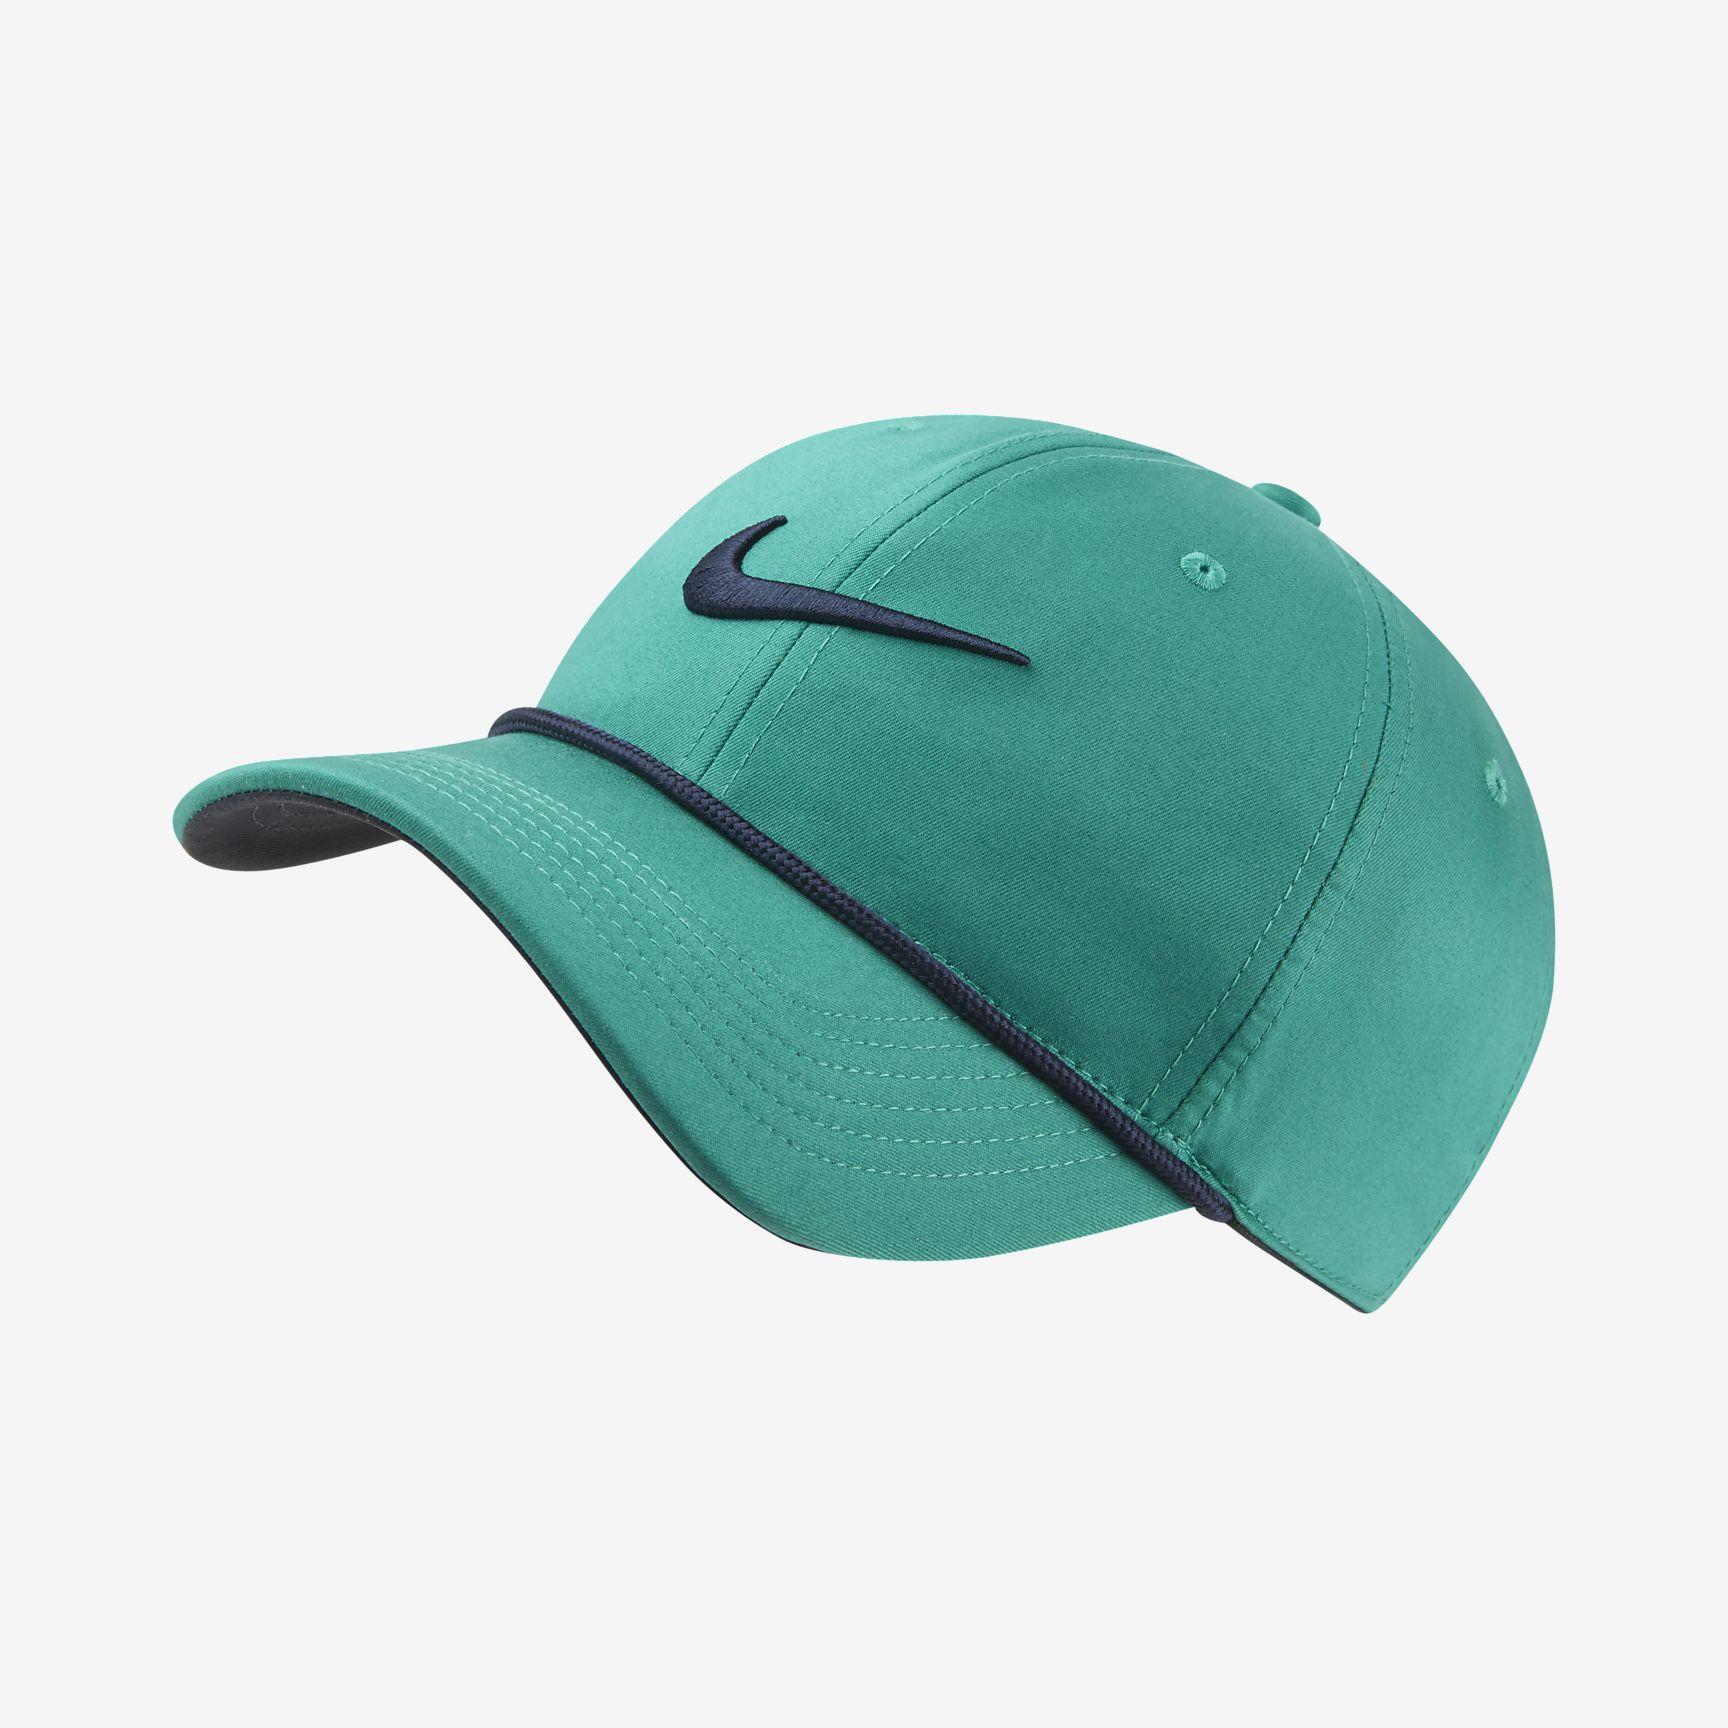 aerobill-classic99-unisex-golf-hat-5q5Vqw.jpg